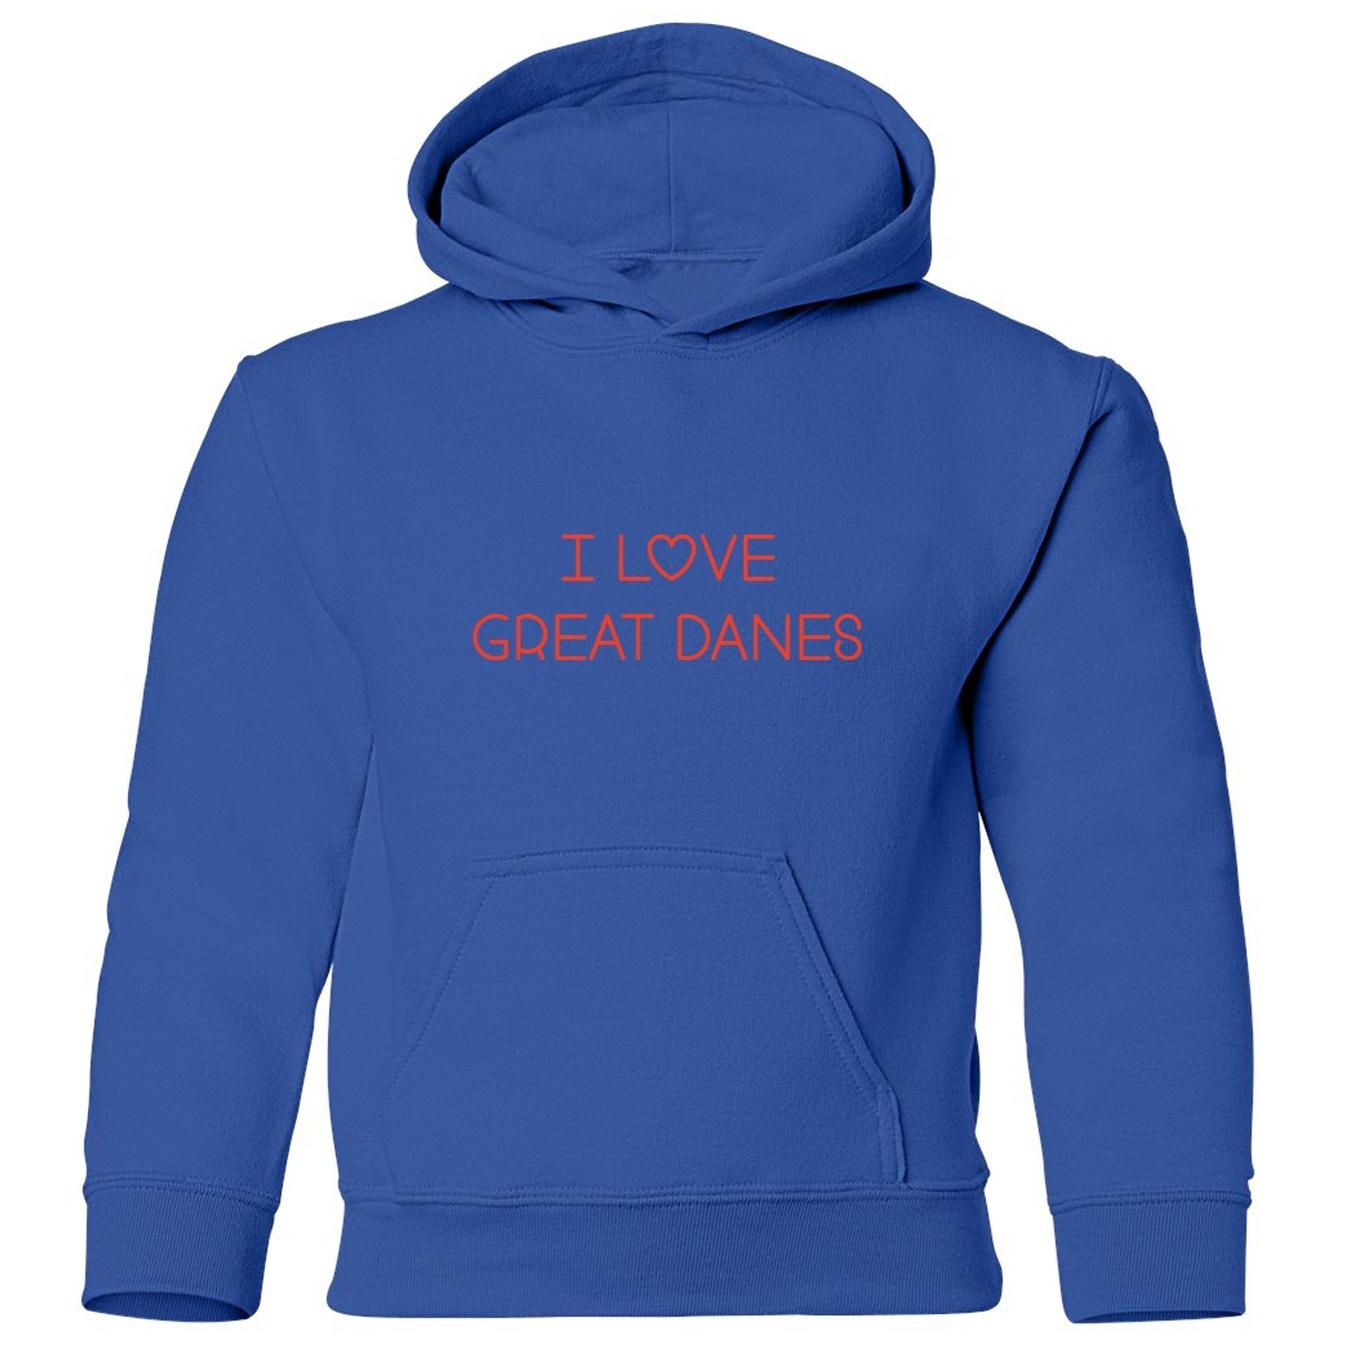 Mashed Clothing I Love Great Danes Kids Hooded Sweatshirt at Sears.com